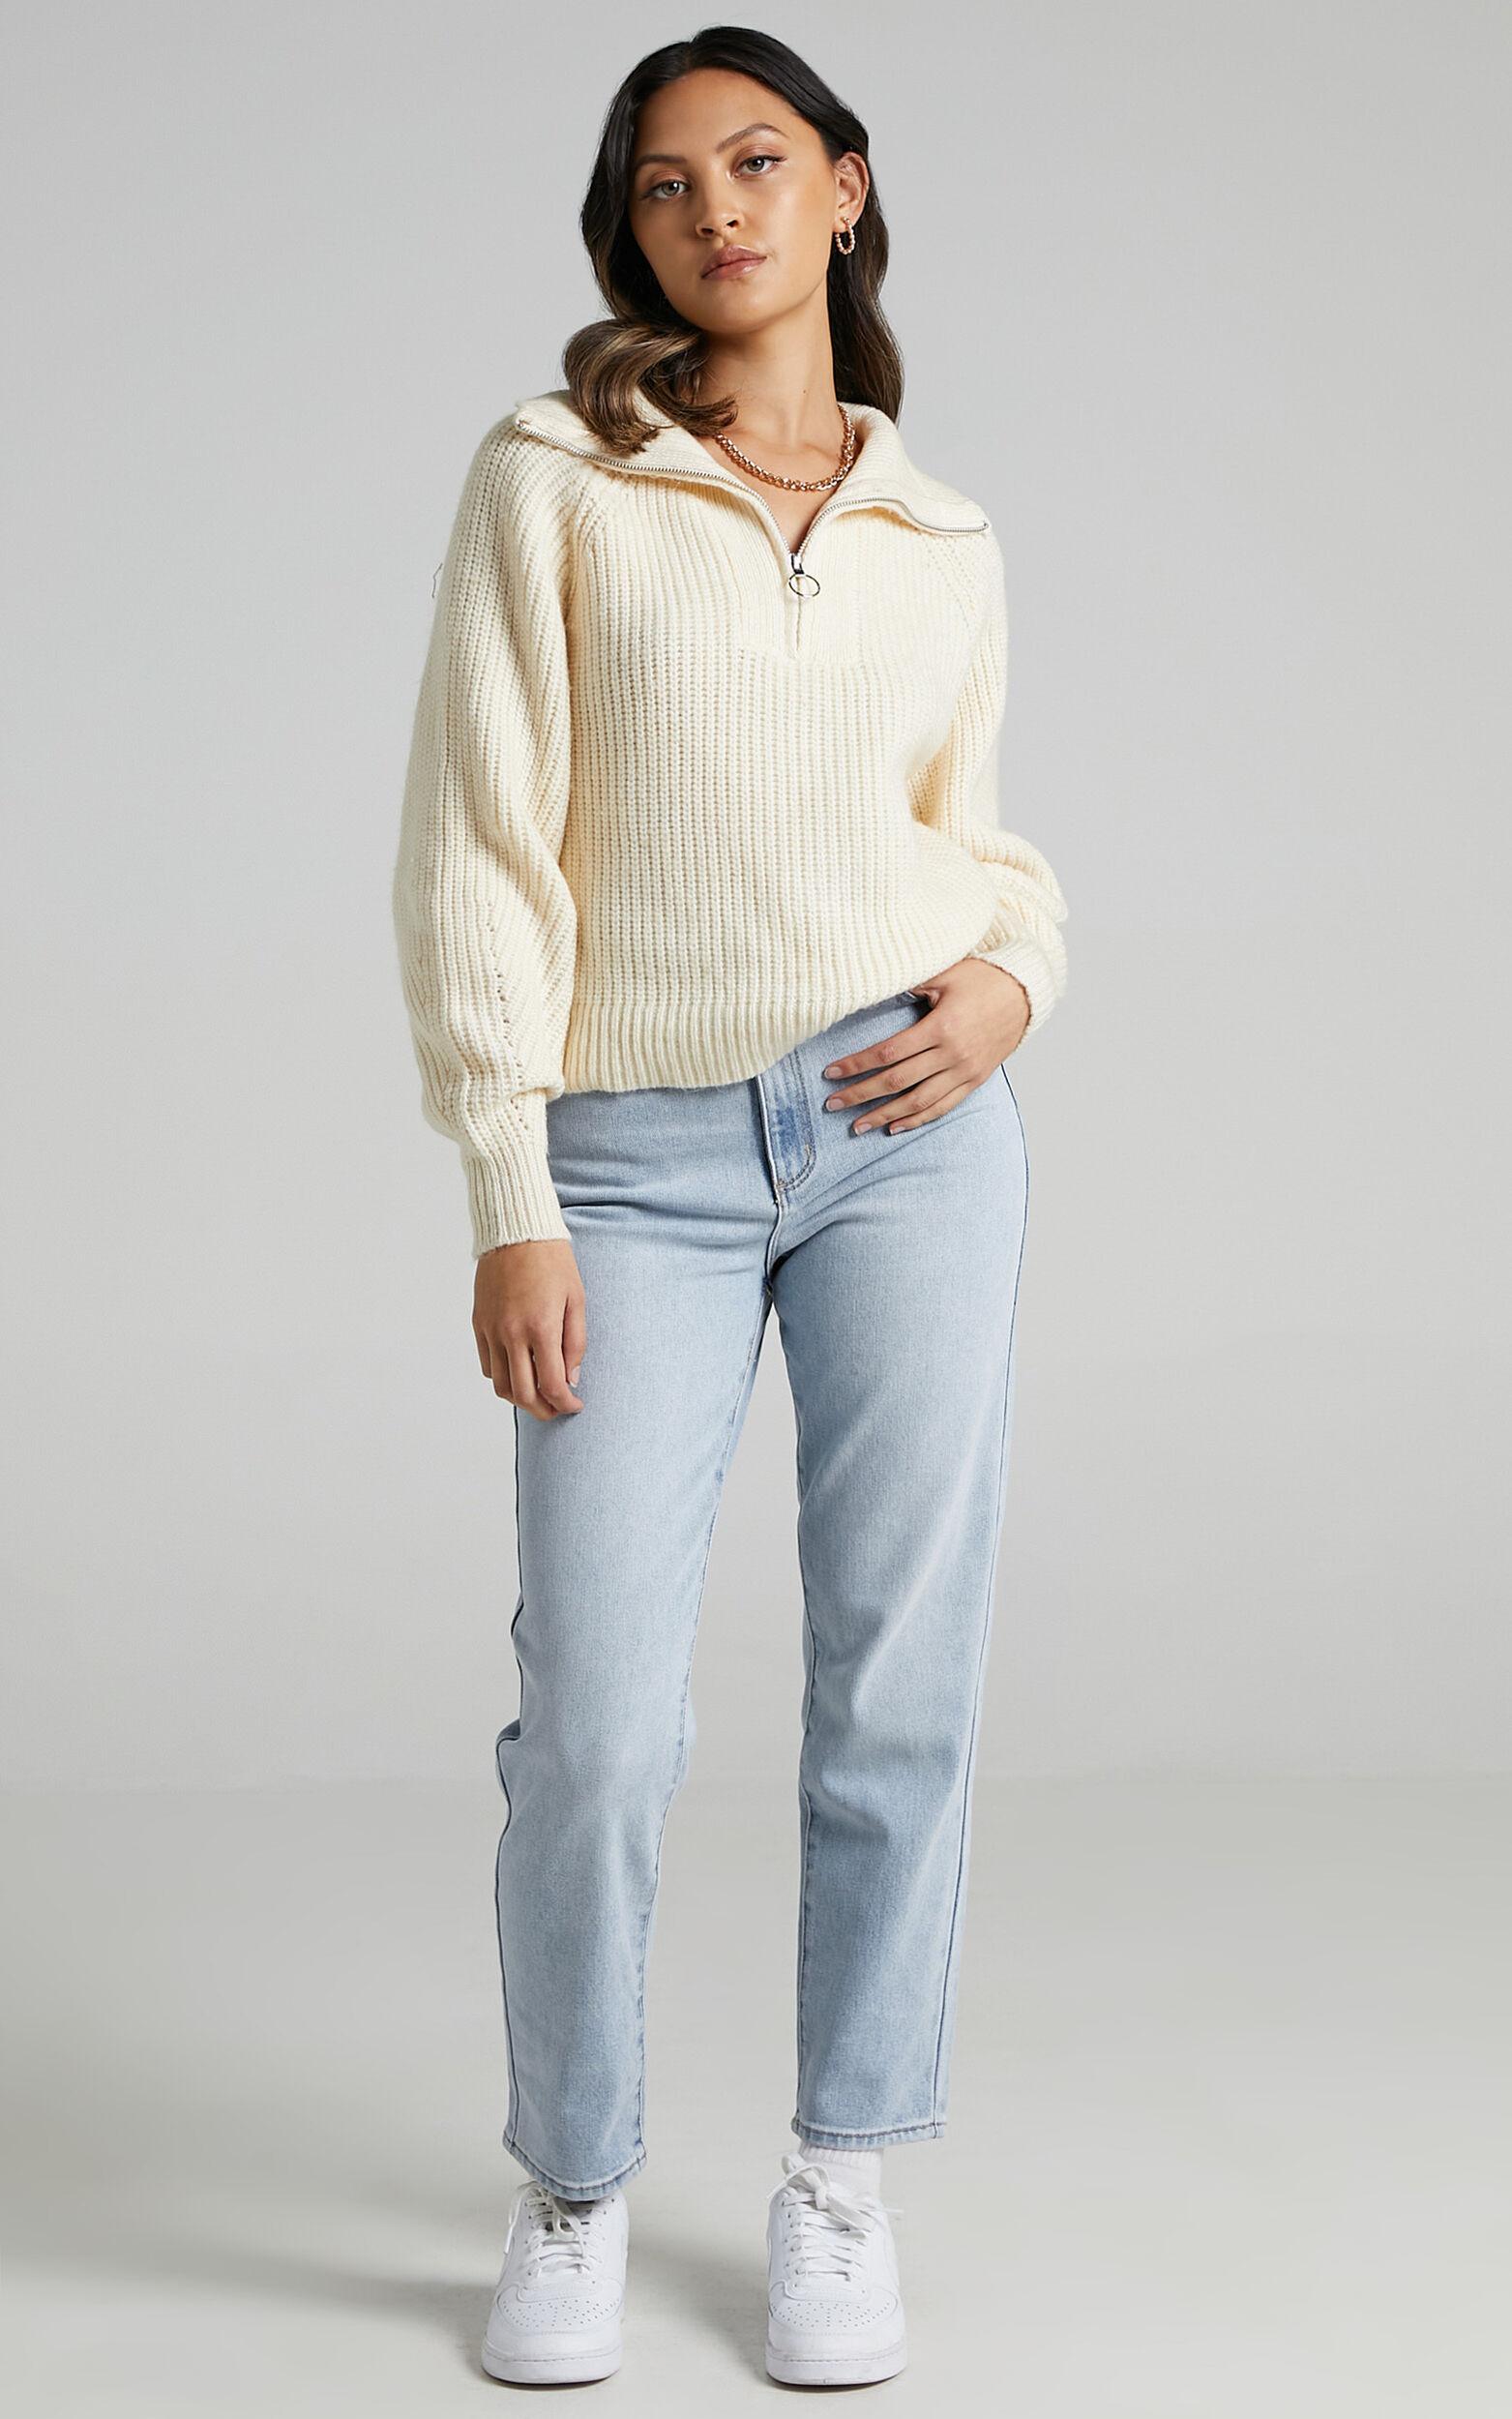 Kodie Knit Jumper in Cream - 04, CRE3, super-hi-res image number null